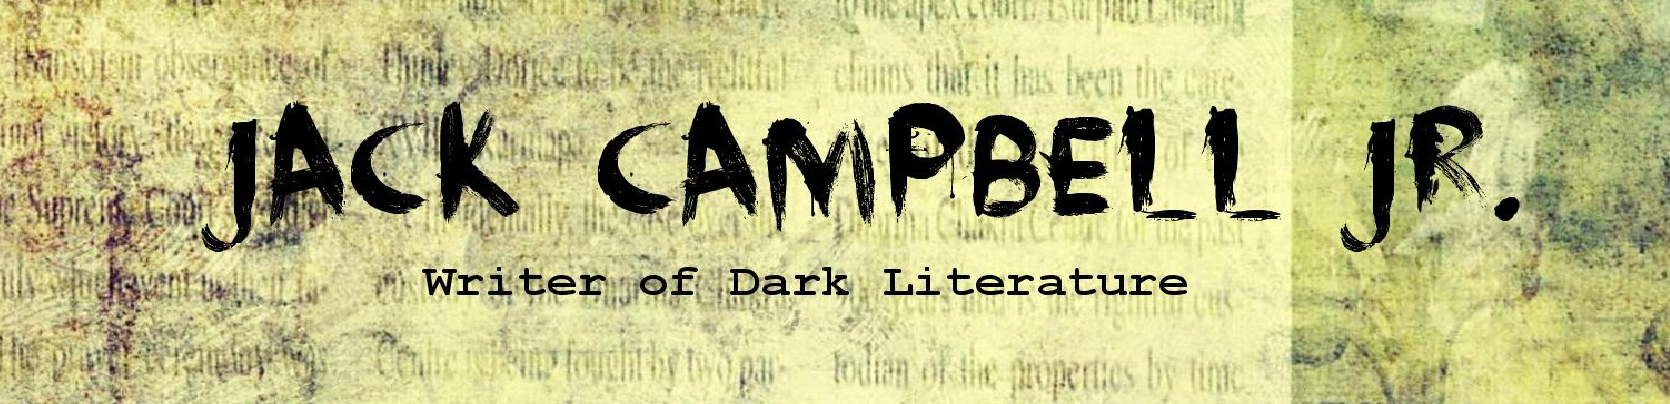 Jack Campbell Jr.